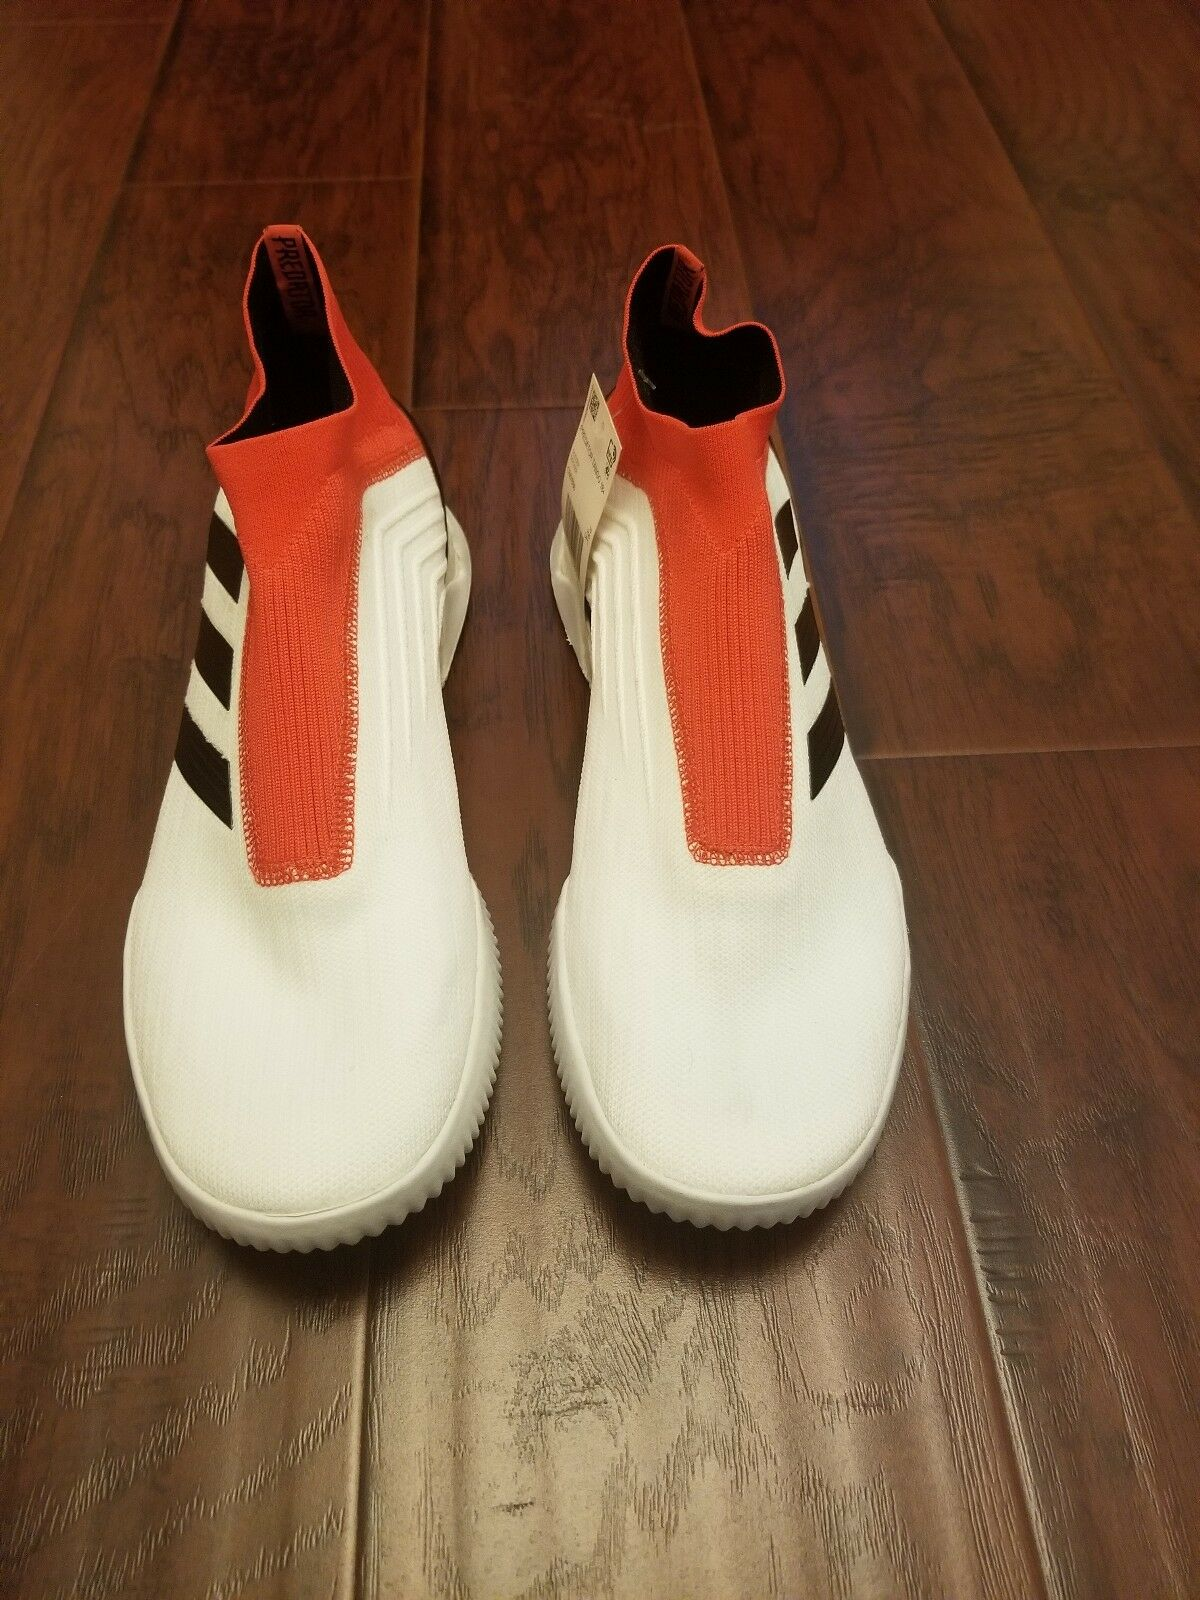 Pennino Pennino Pennino adidas predator tango 18 + tr impulso scarpe taglia 10,5 cm7686 uomini c3b1a3